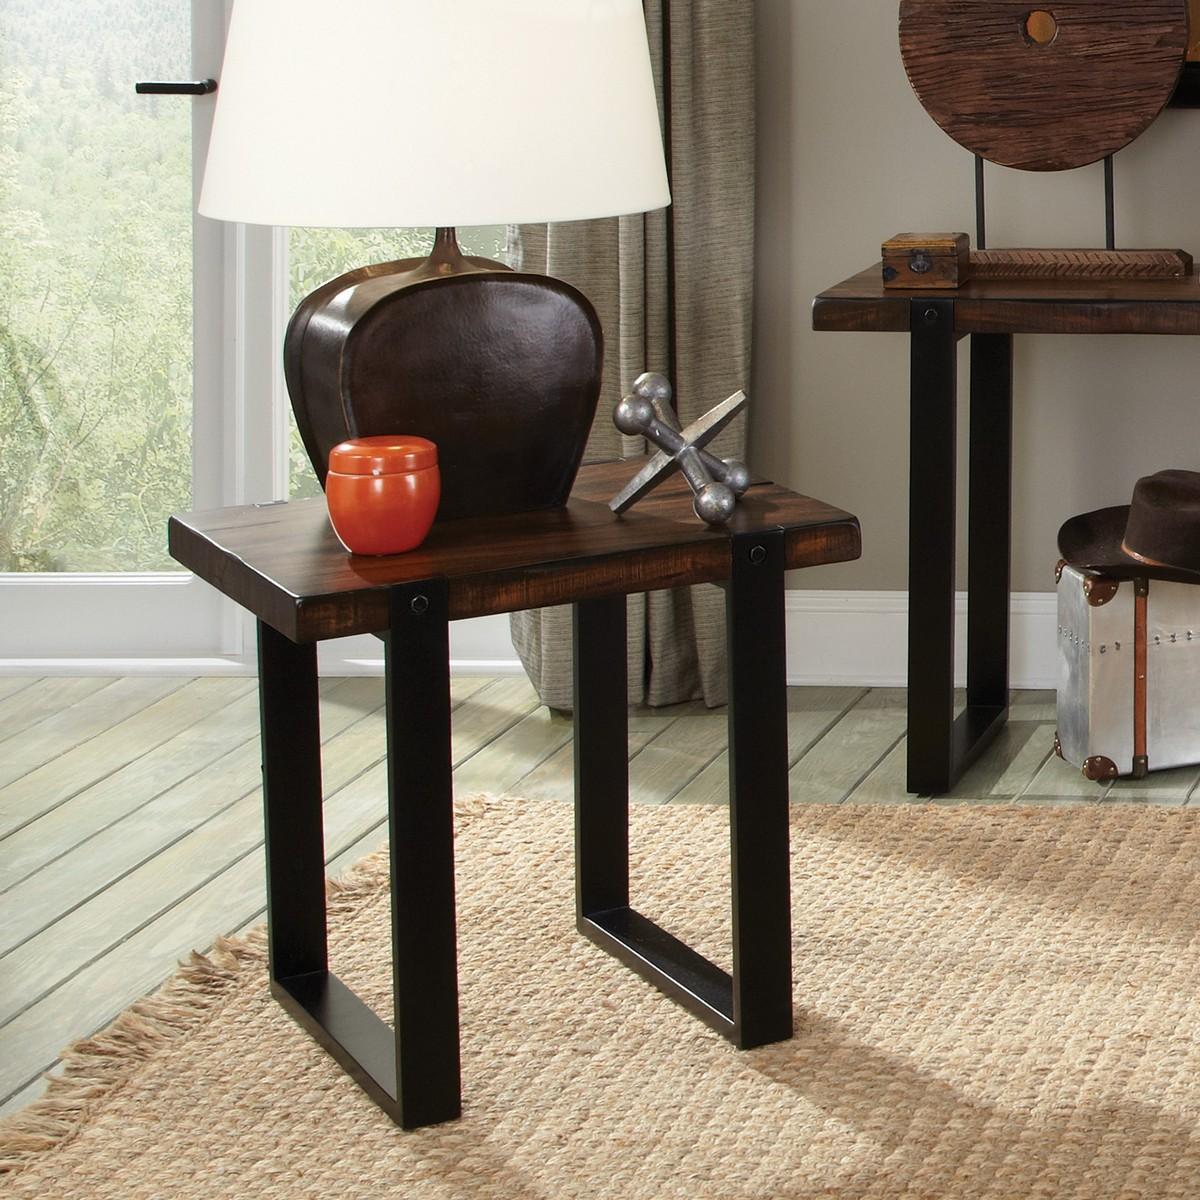 Coaster 703427 End Table - Vintage Brown/black